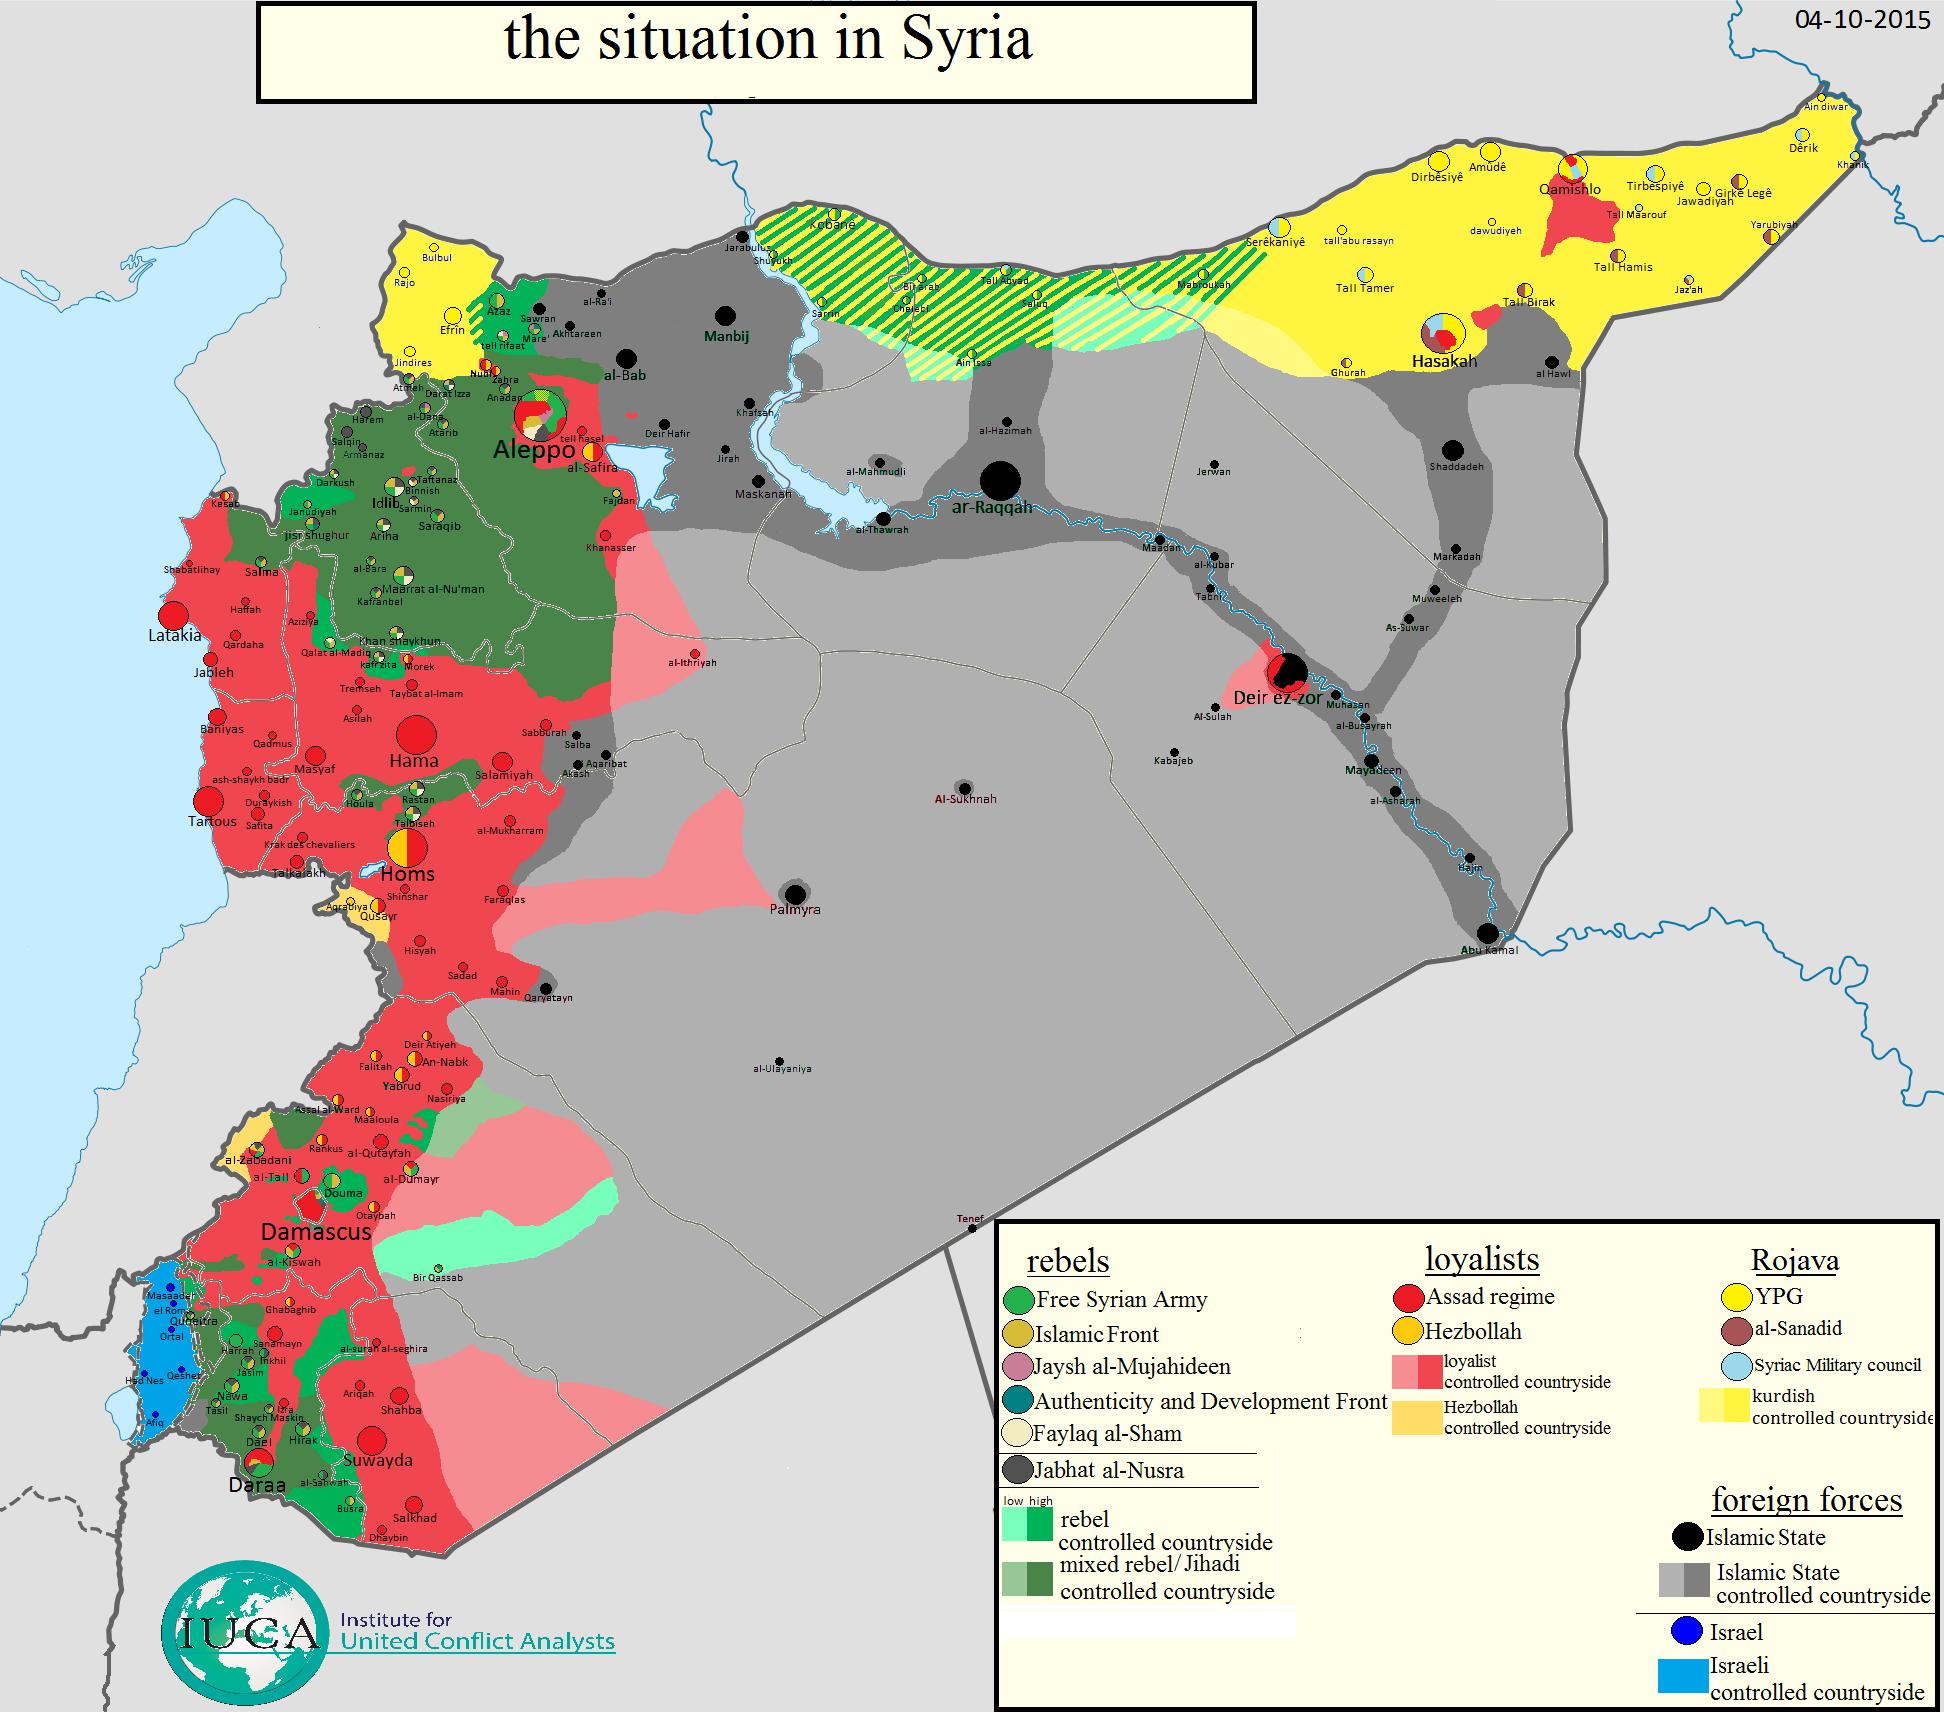 http://www.les-crises.fr/wp-content/uploads/2015/10/34-syrie-10-2015.png